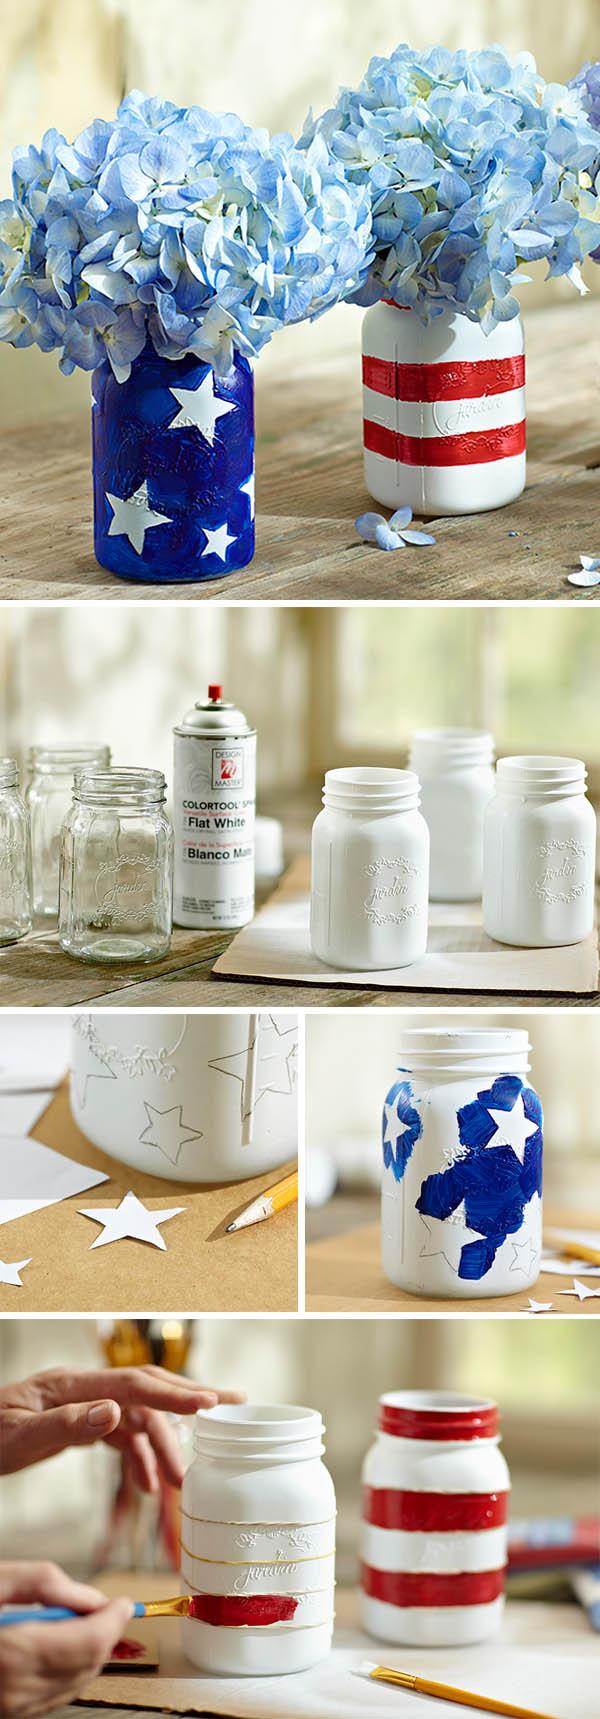 Best ideas about 101 DIY Mason Jar Wedding Ideas . Save or Pin Ten Inspirational DIY Mason Jar Ideas For Weddings Now.